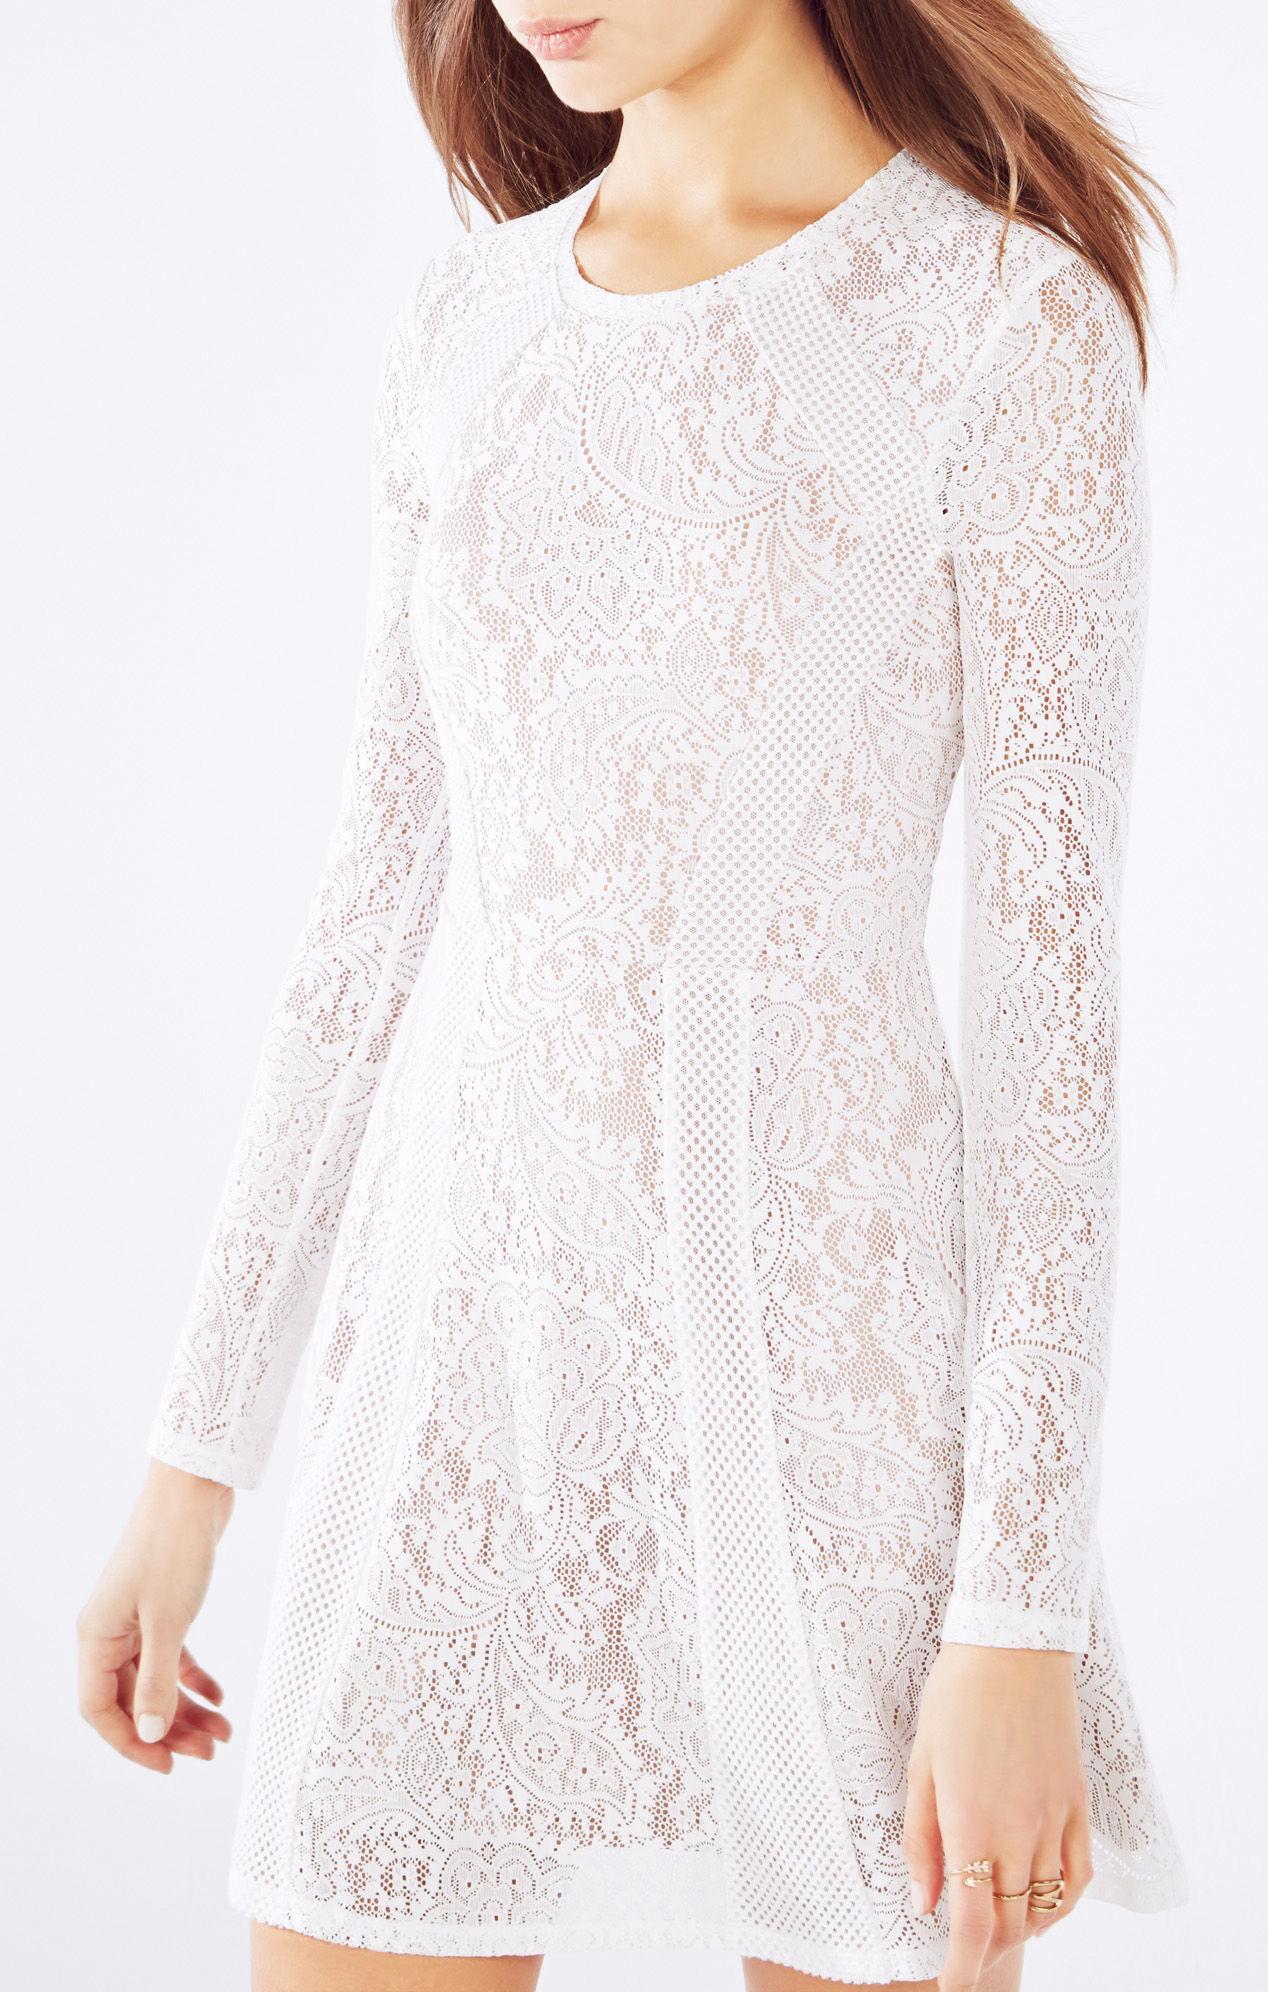 Bcbg lace white long sleeve dress